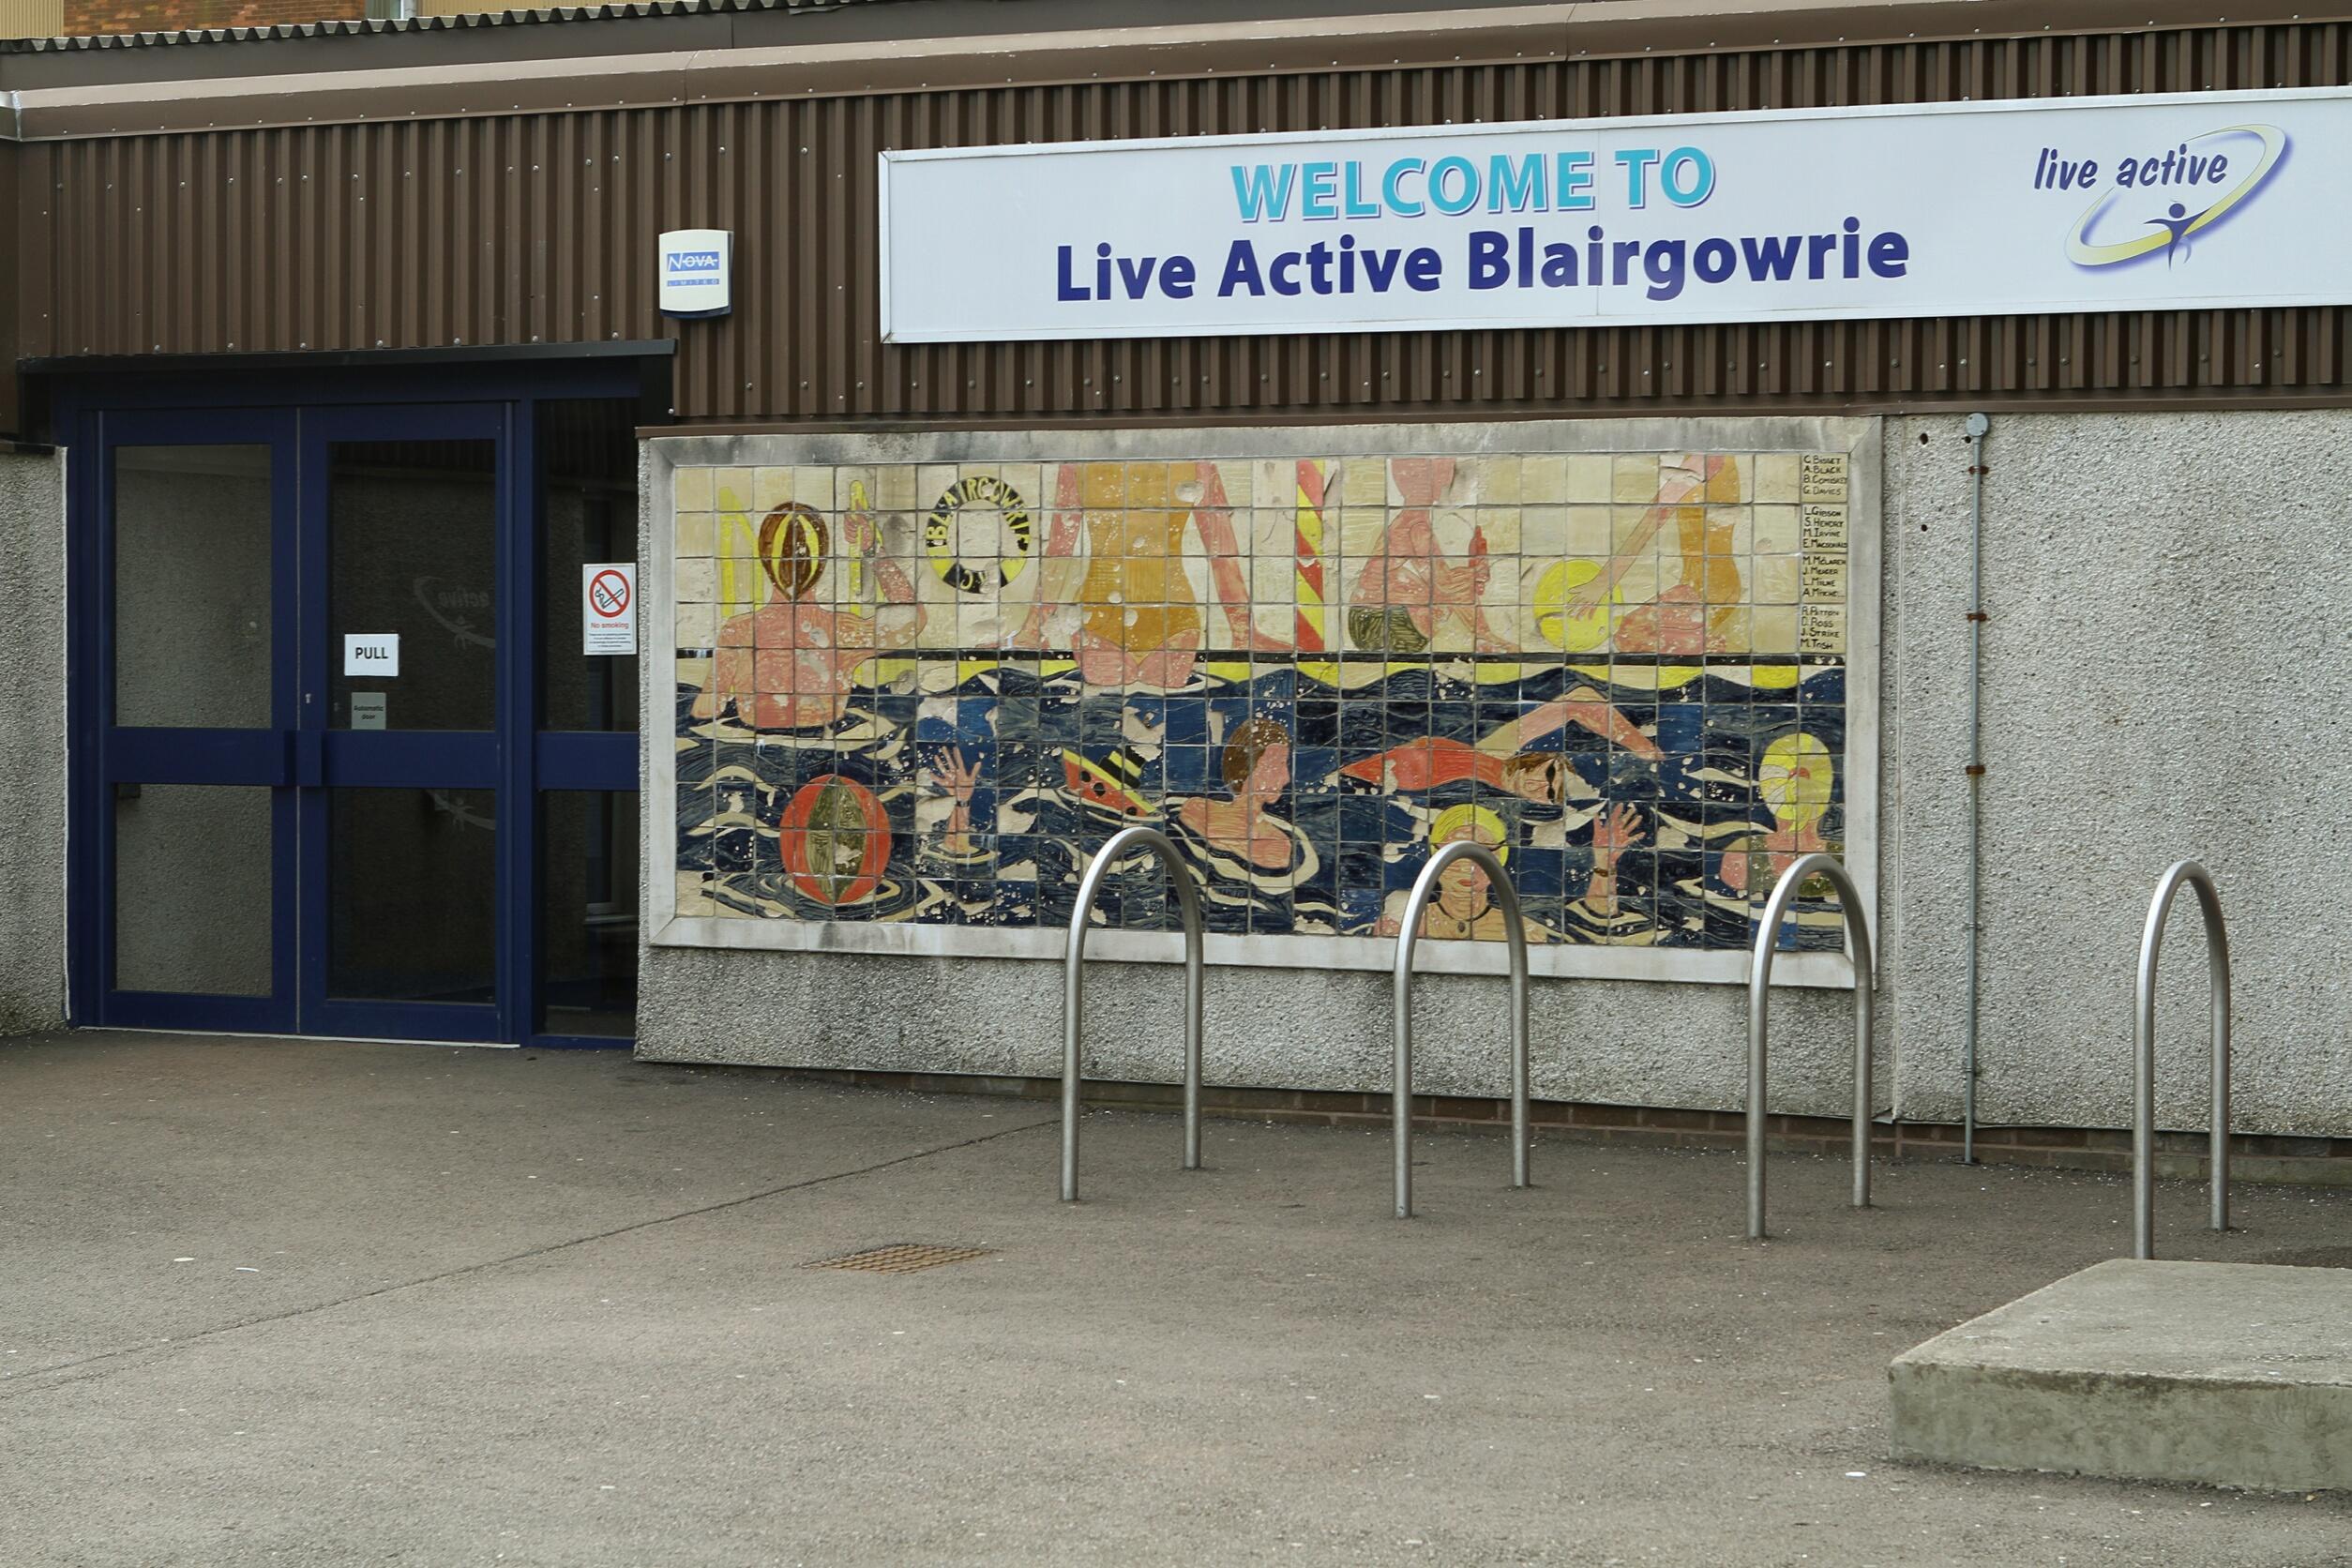 Blairgowrie recreational centre.